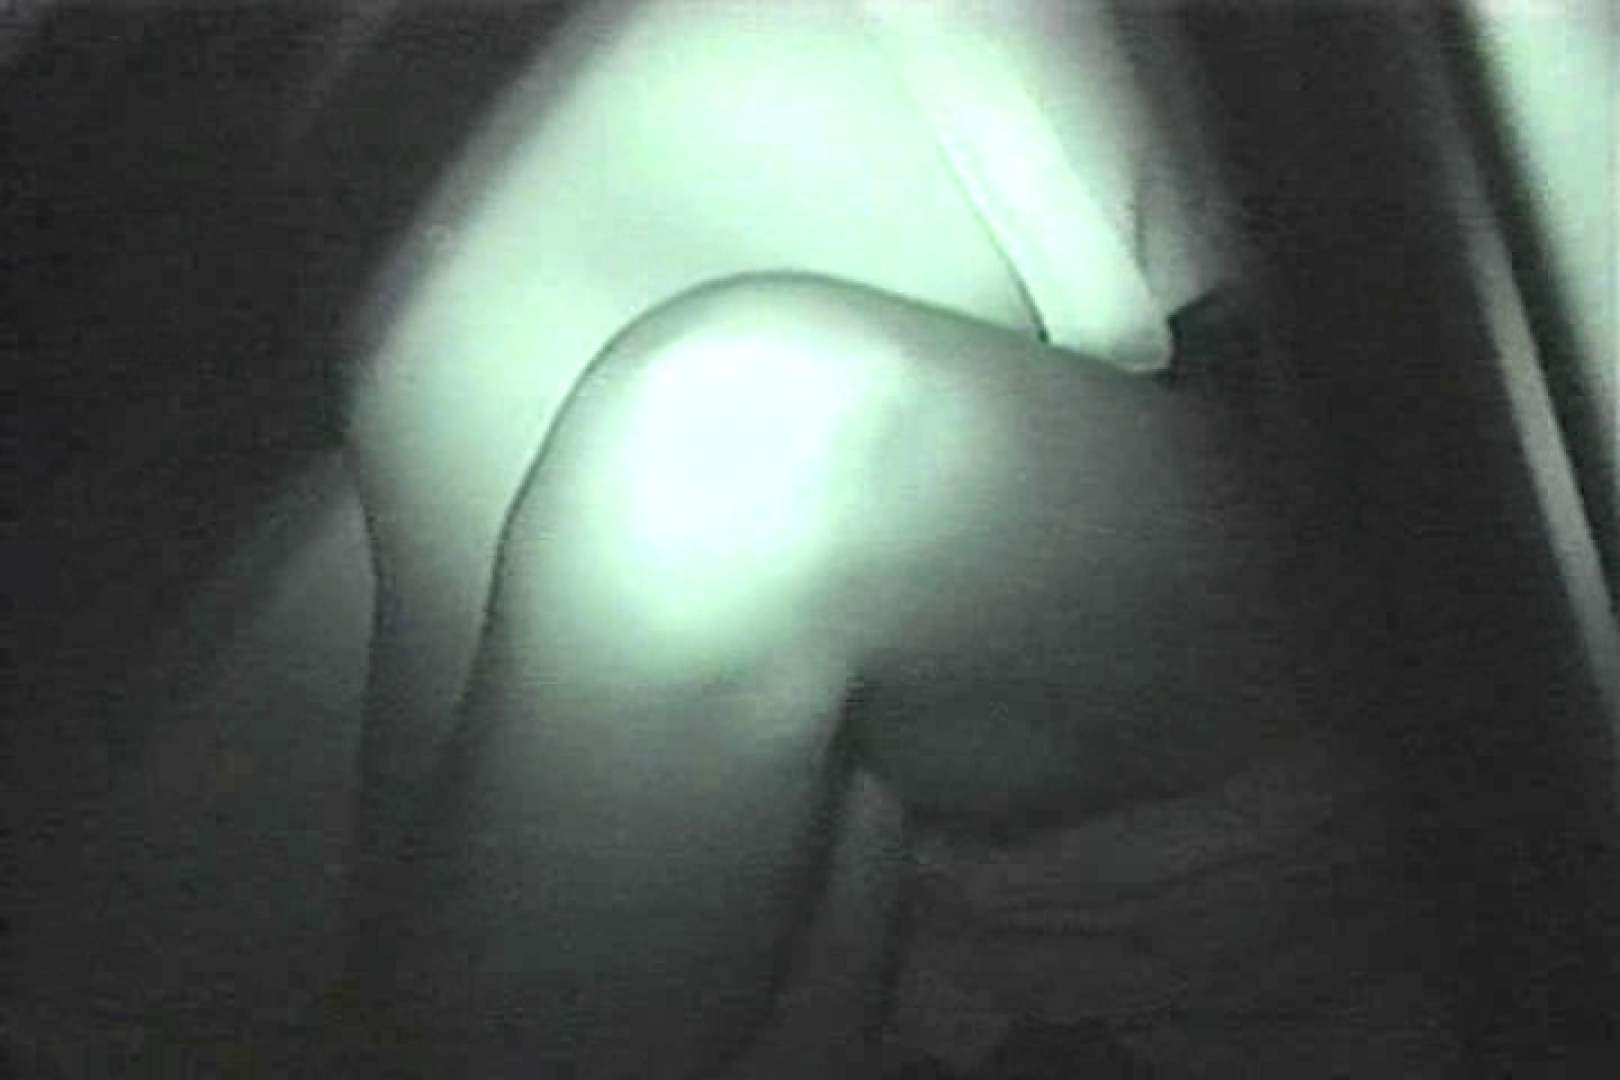 MASAさんの待ち伏せ撮り! 赤外線カーセックスVol.8 セックス流出映像 のぞき動画画像 99連発 80